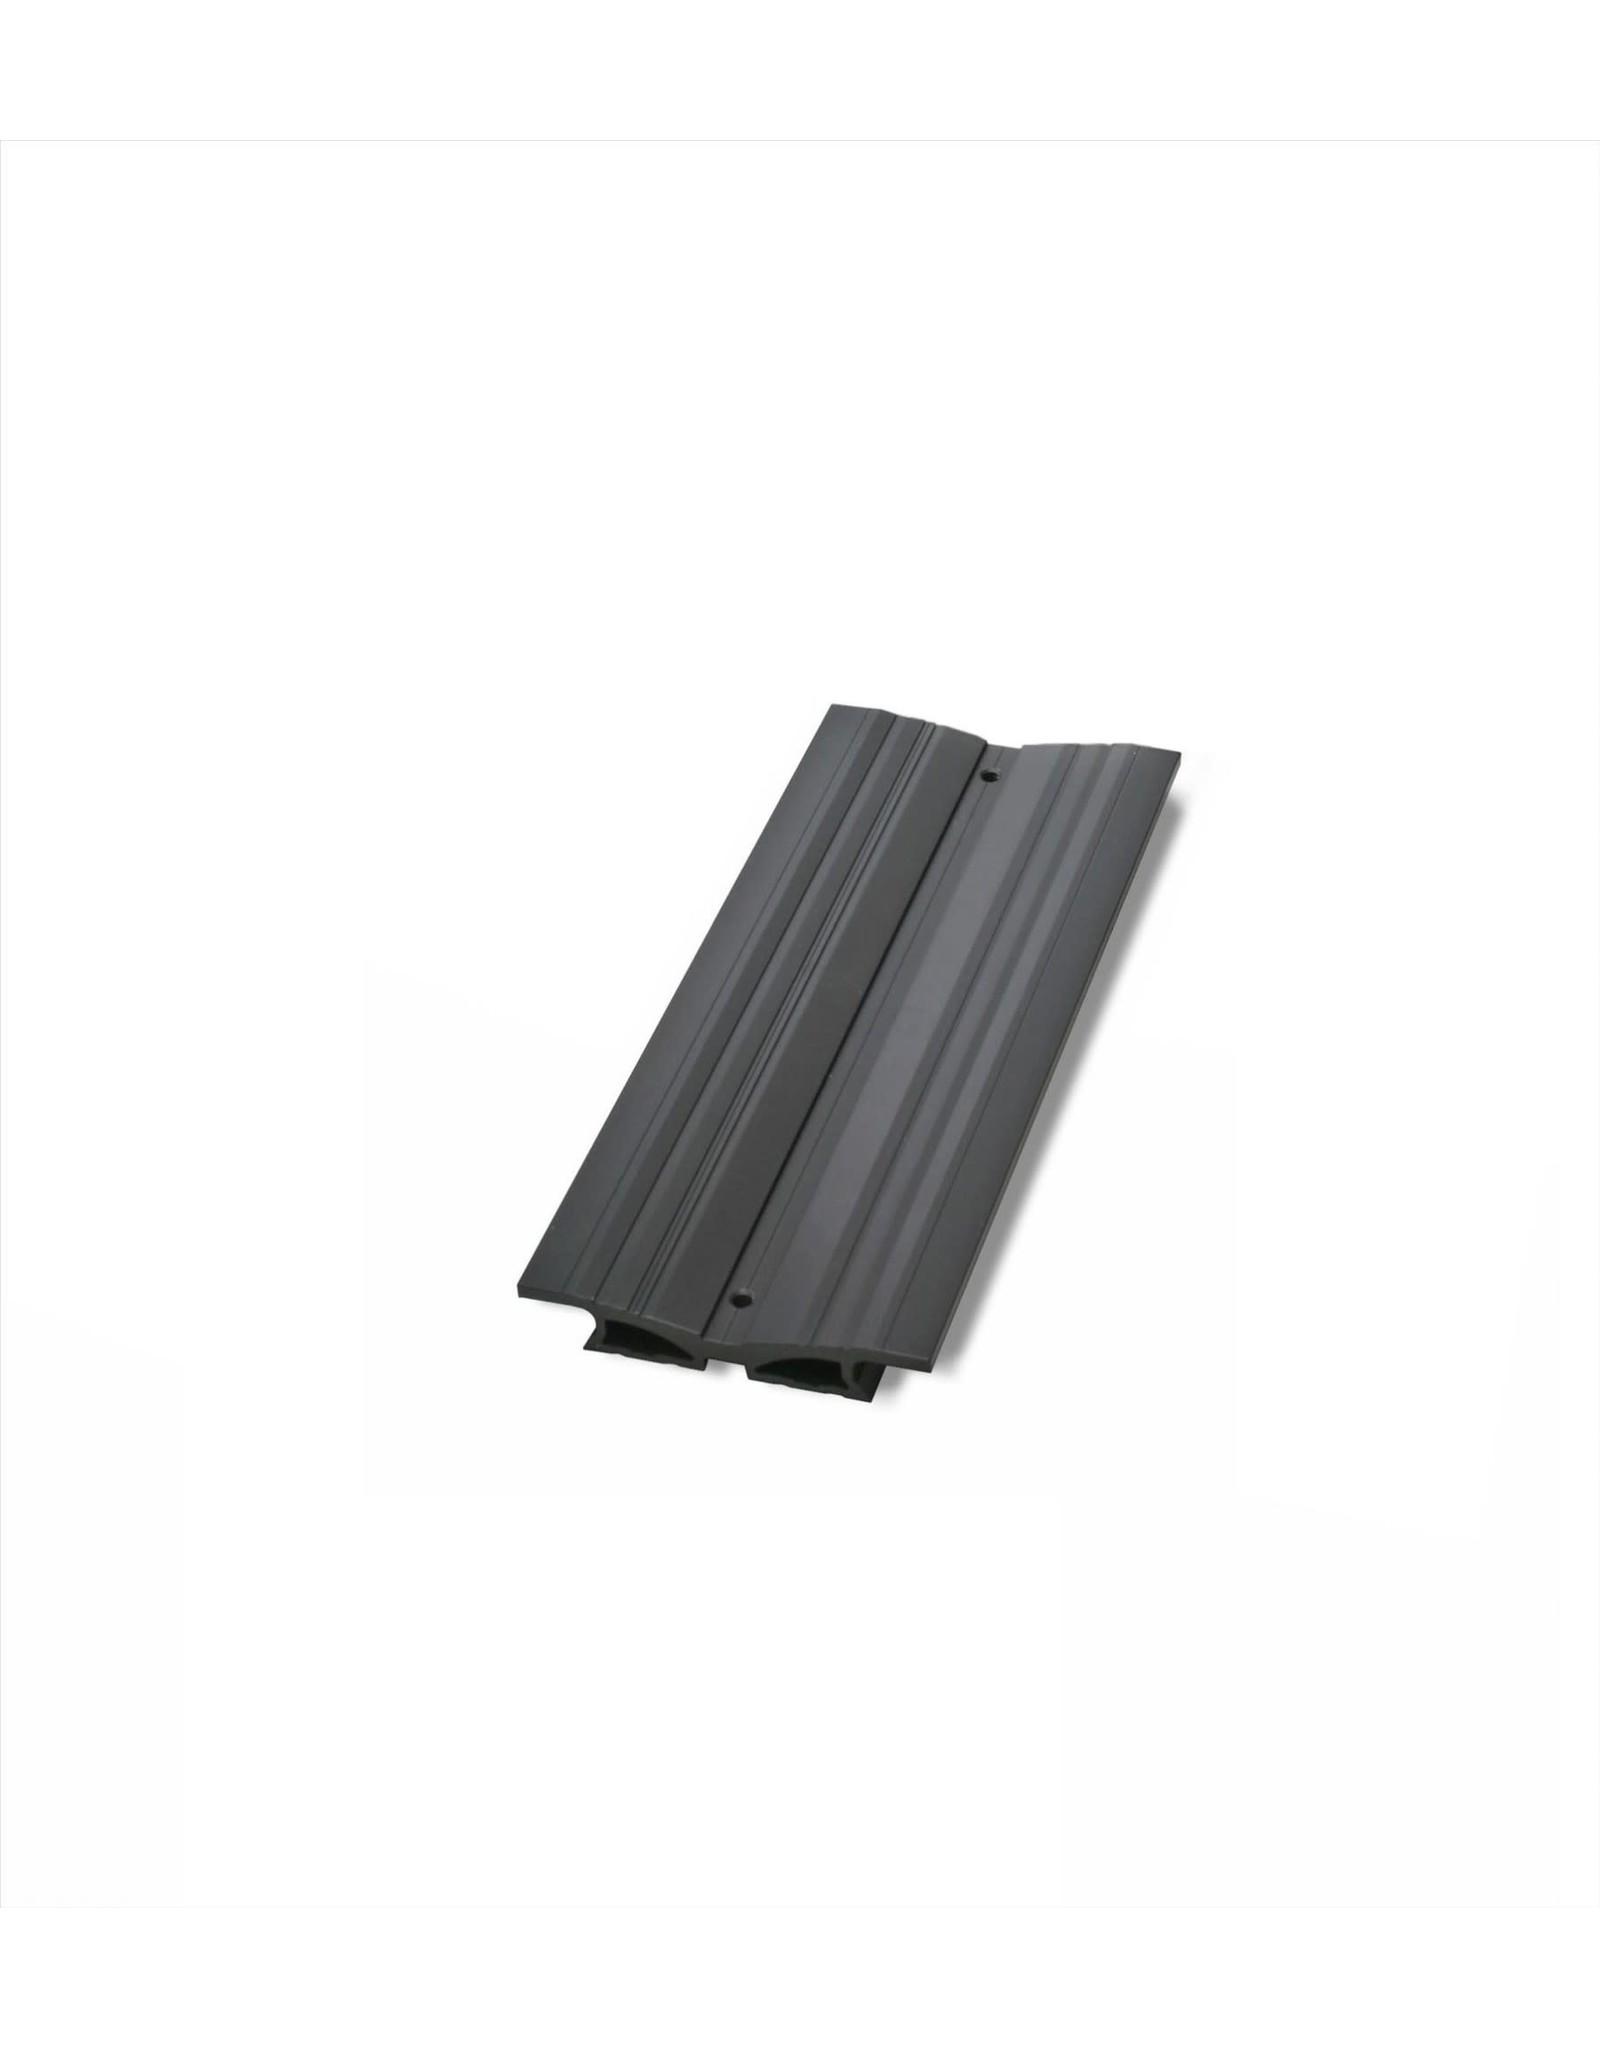 "Baader Planetarium Baader 3"" Dove Tail Bar 250mm (10"") Black anodized"